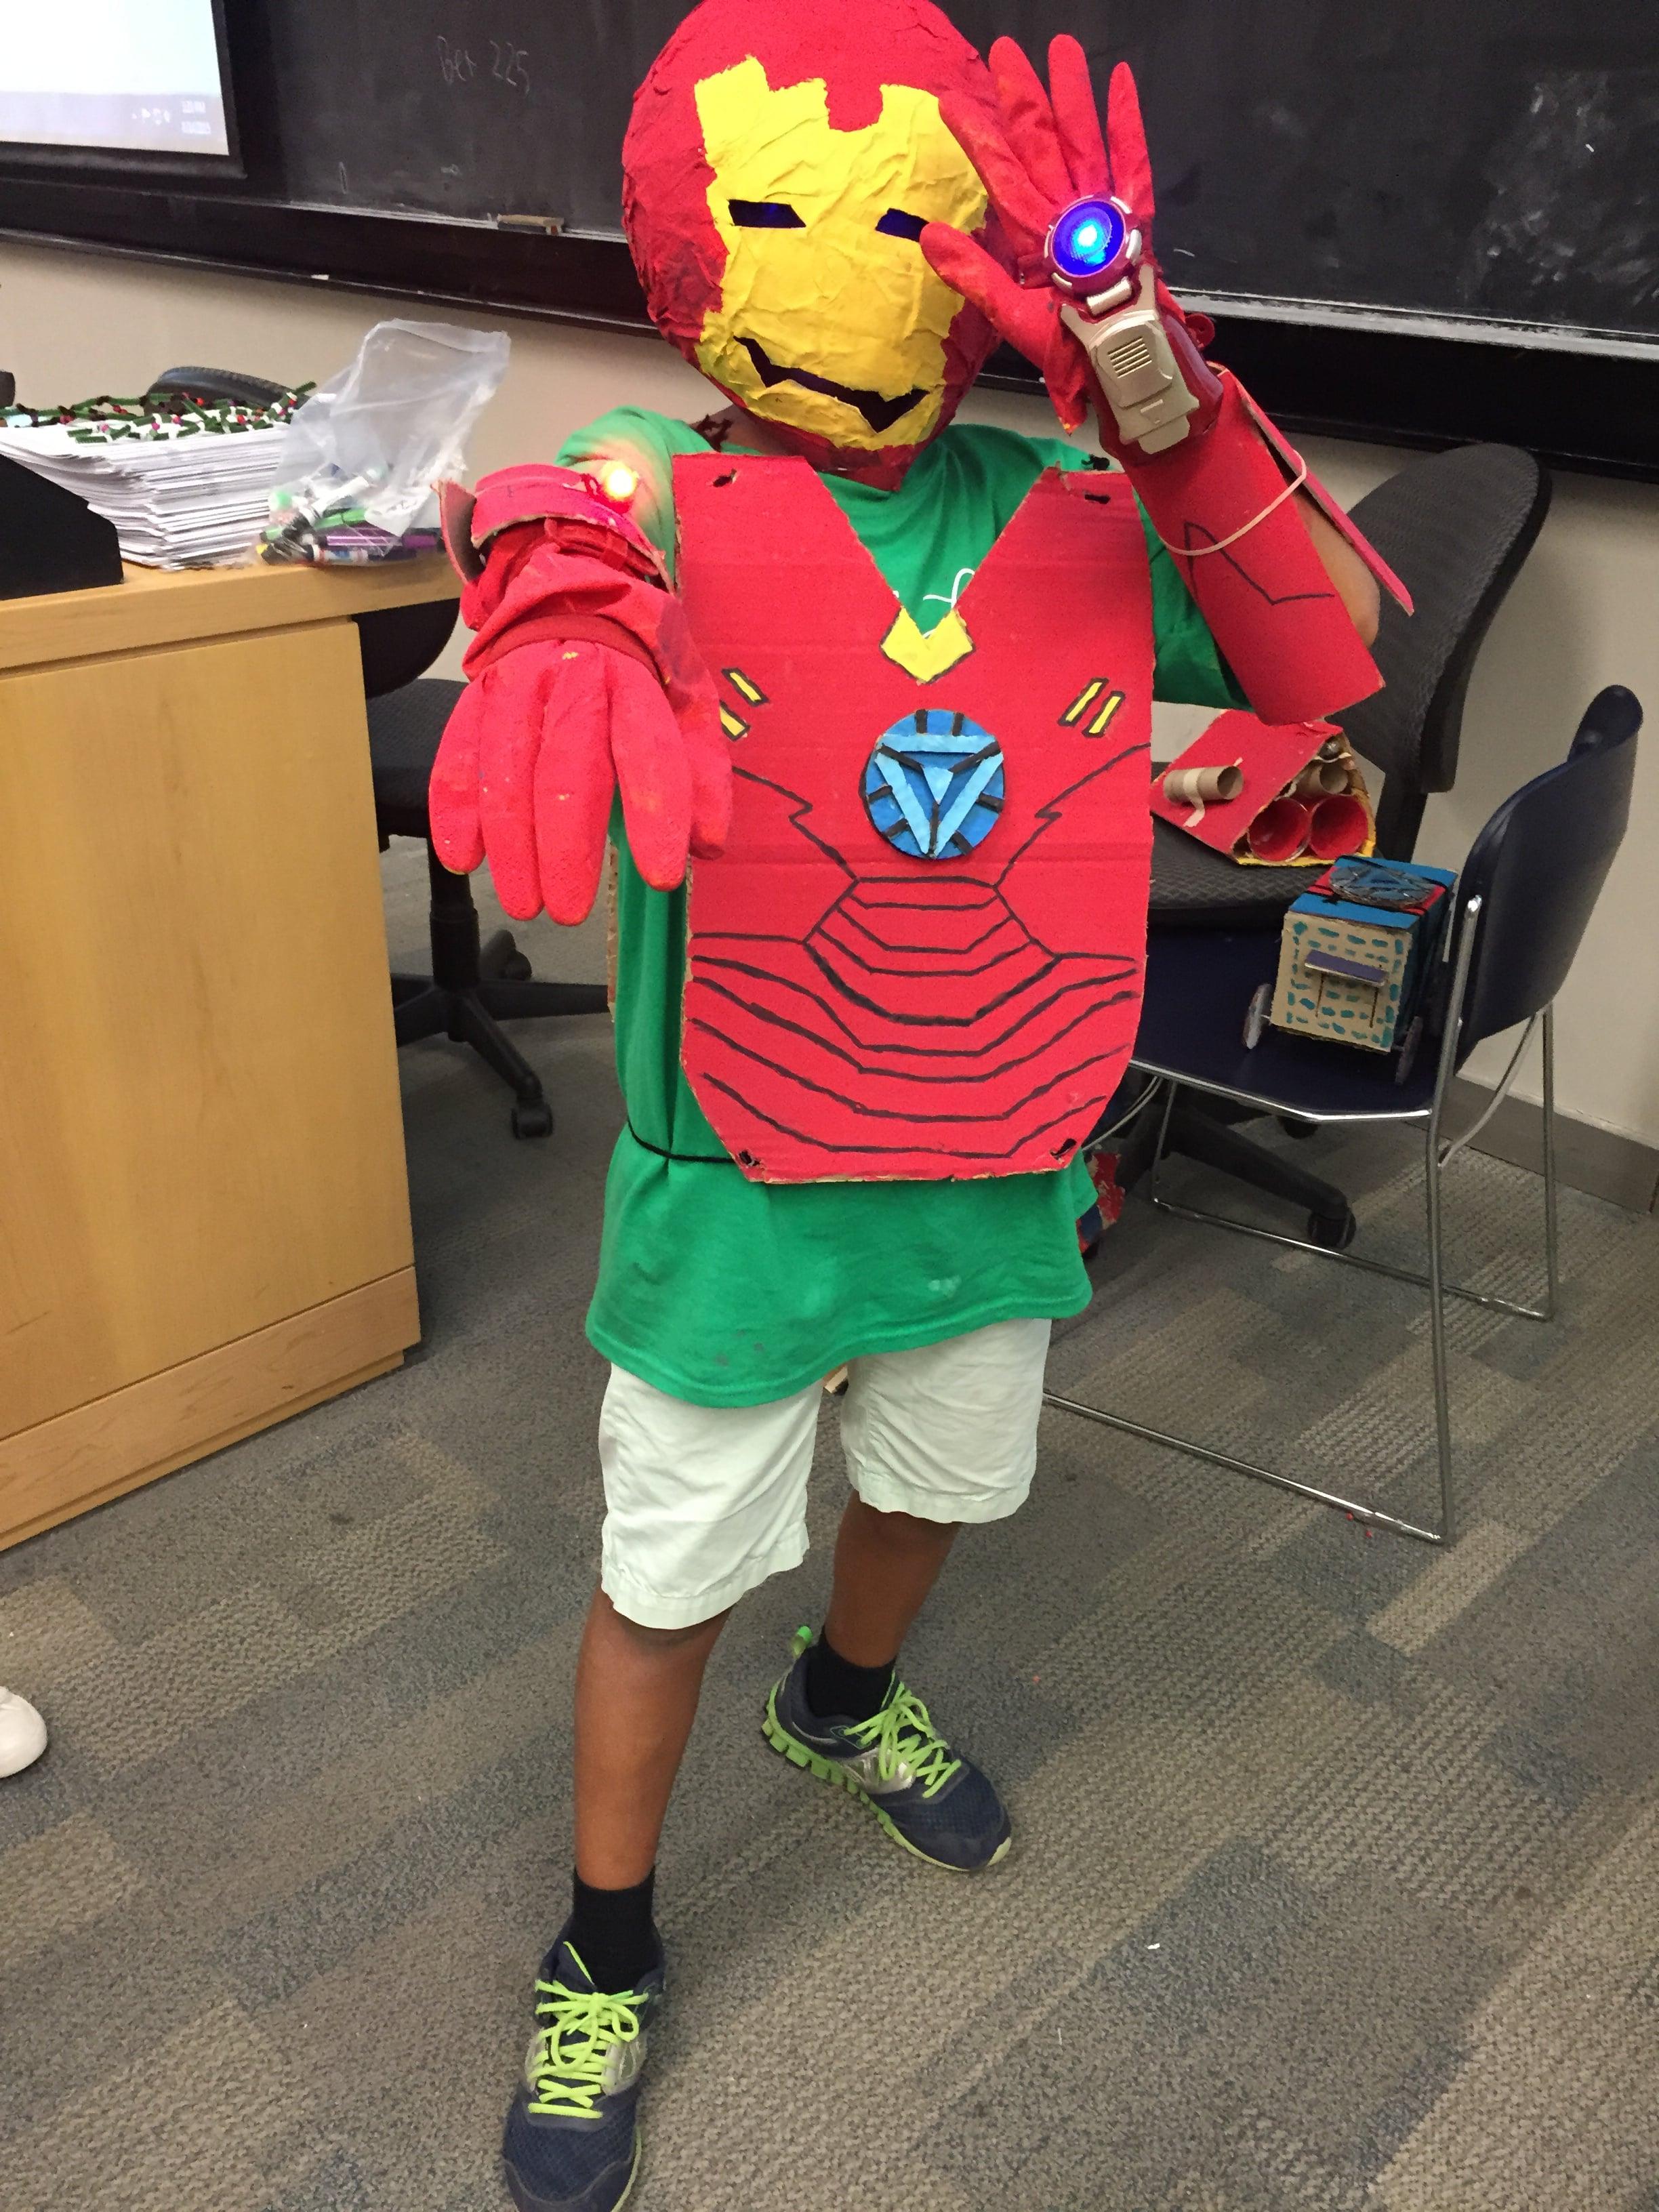 Young boy wearing makeshift Iron Man costume.